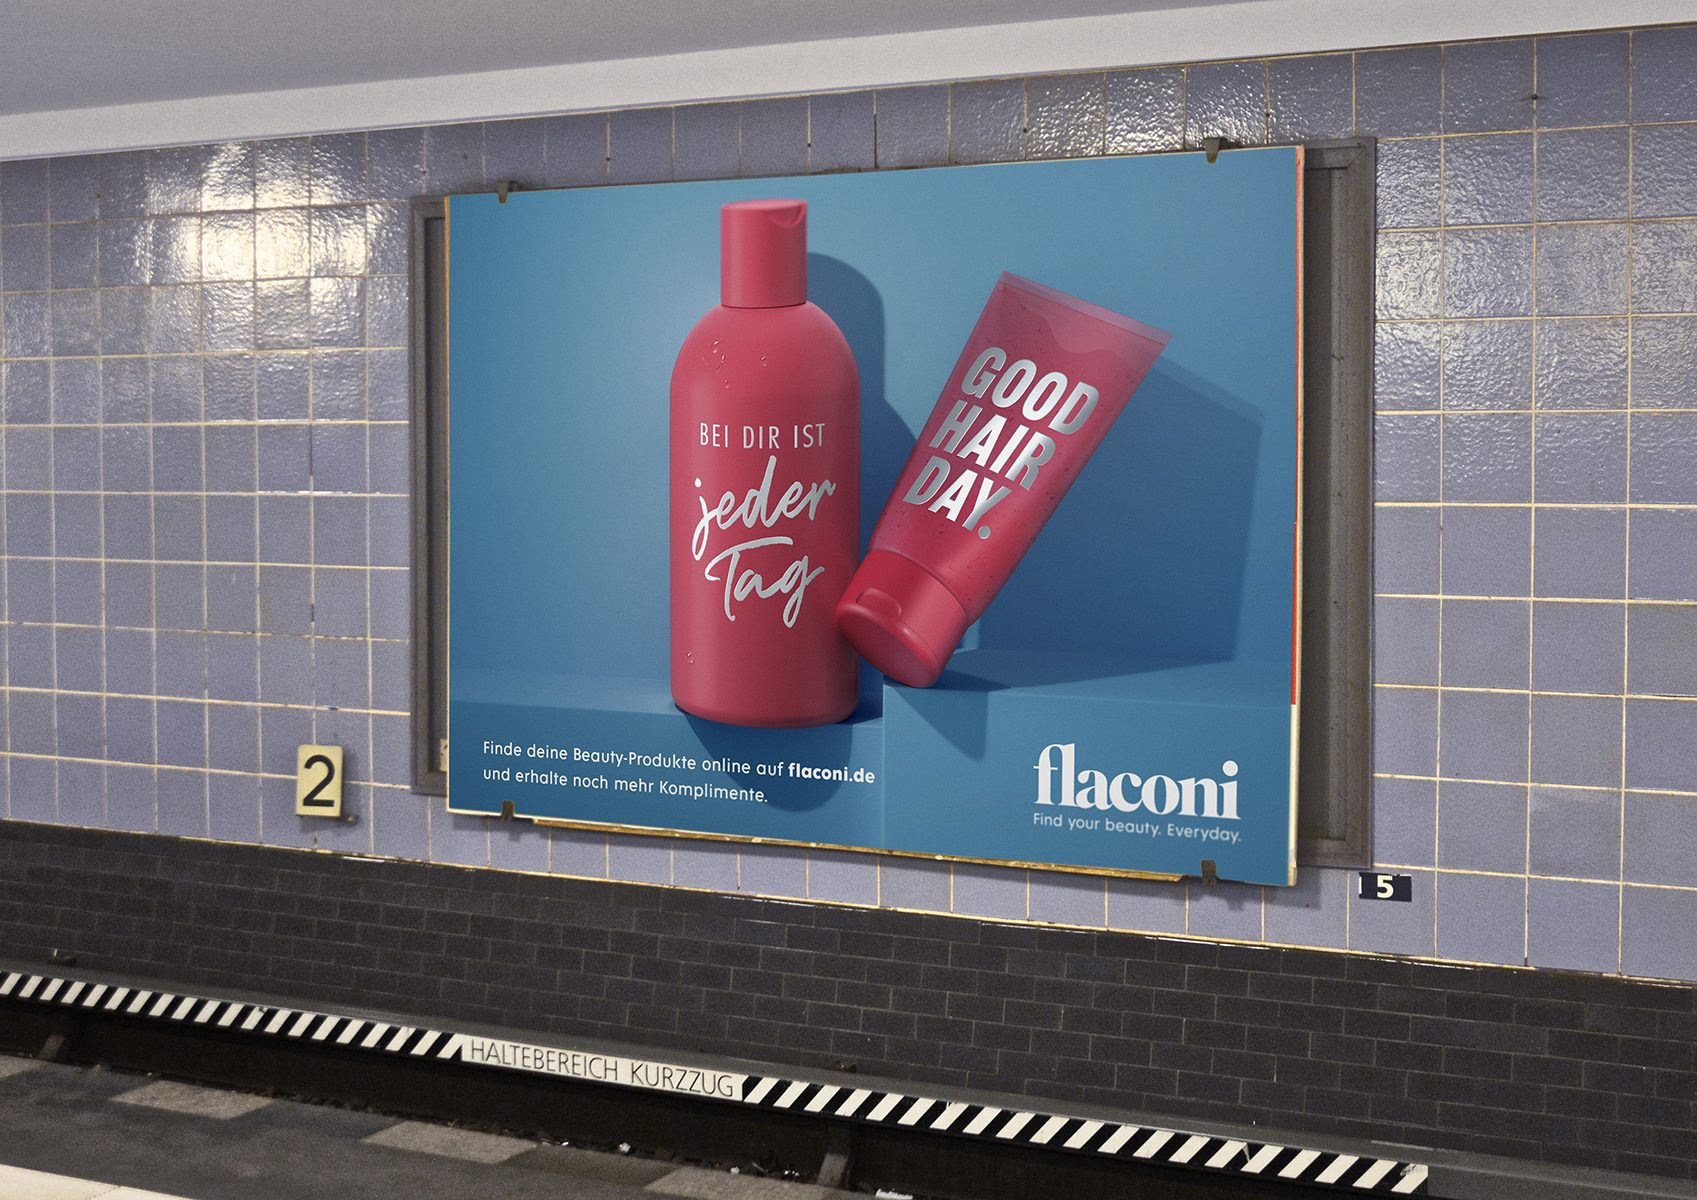 Vanite - Flaconi - OOH-campaign posters around town